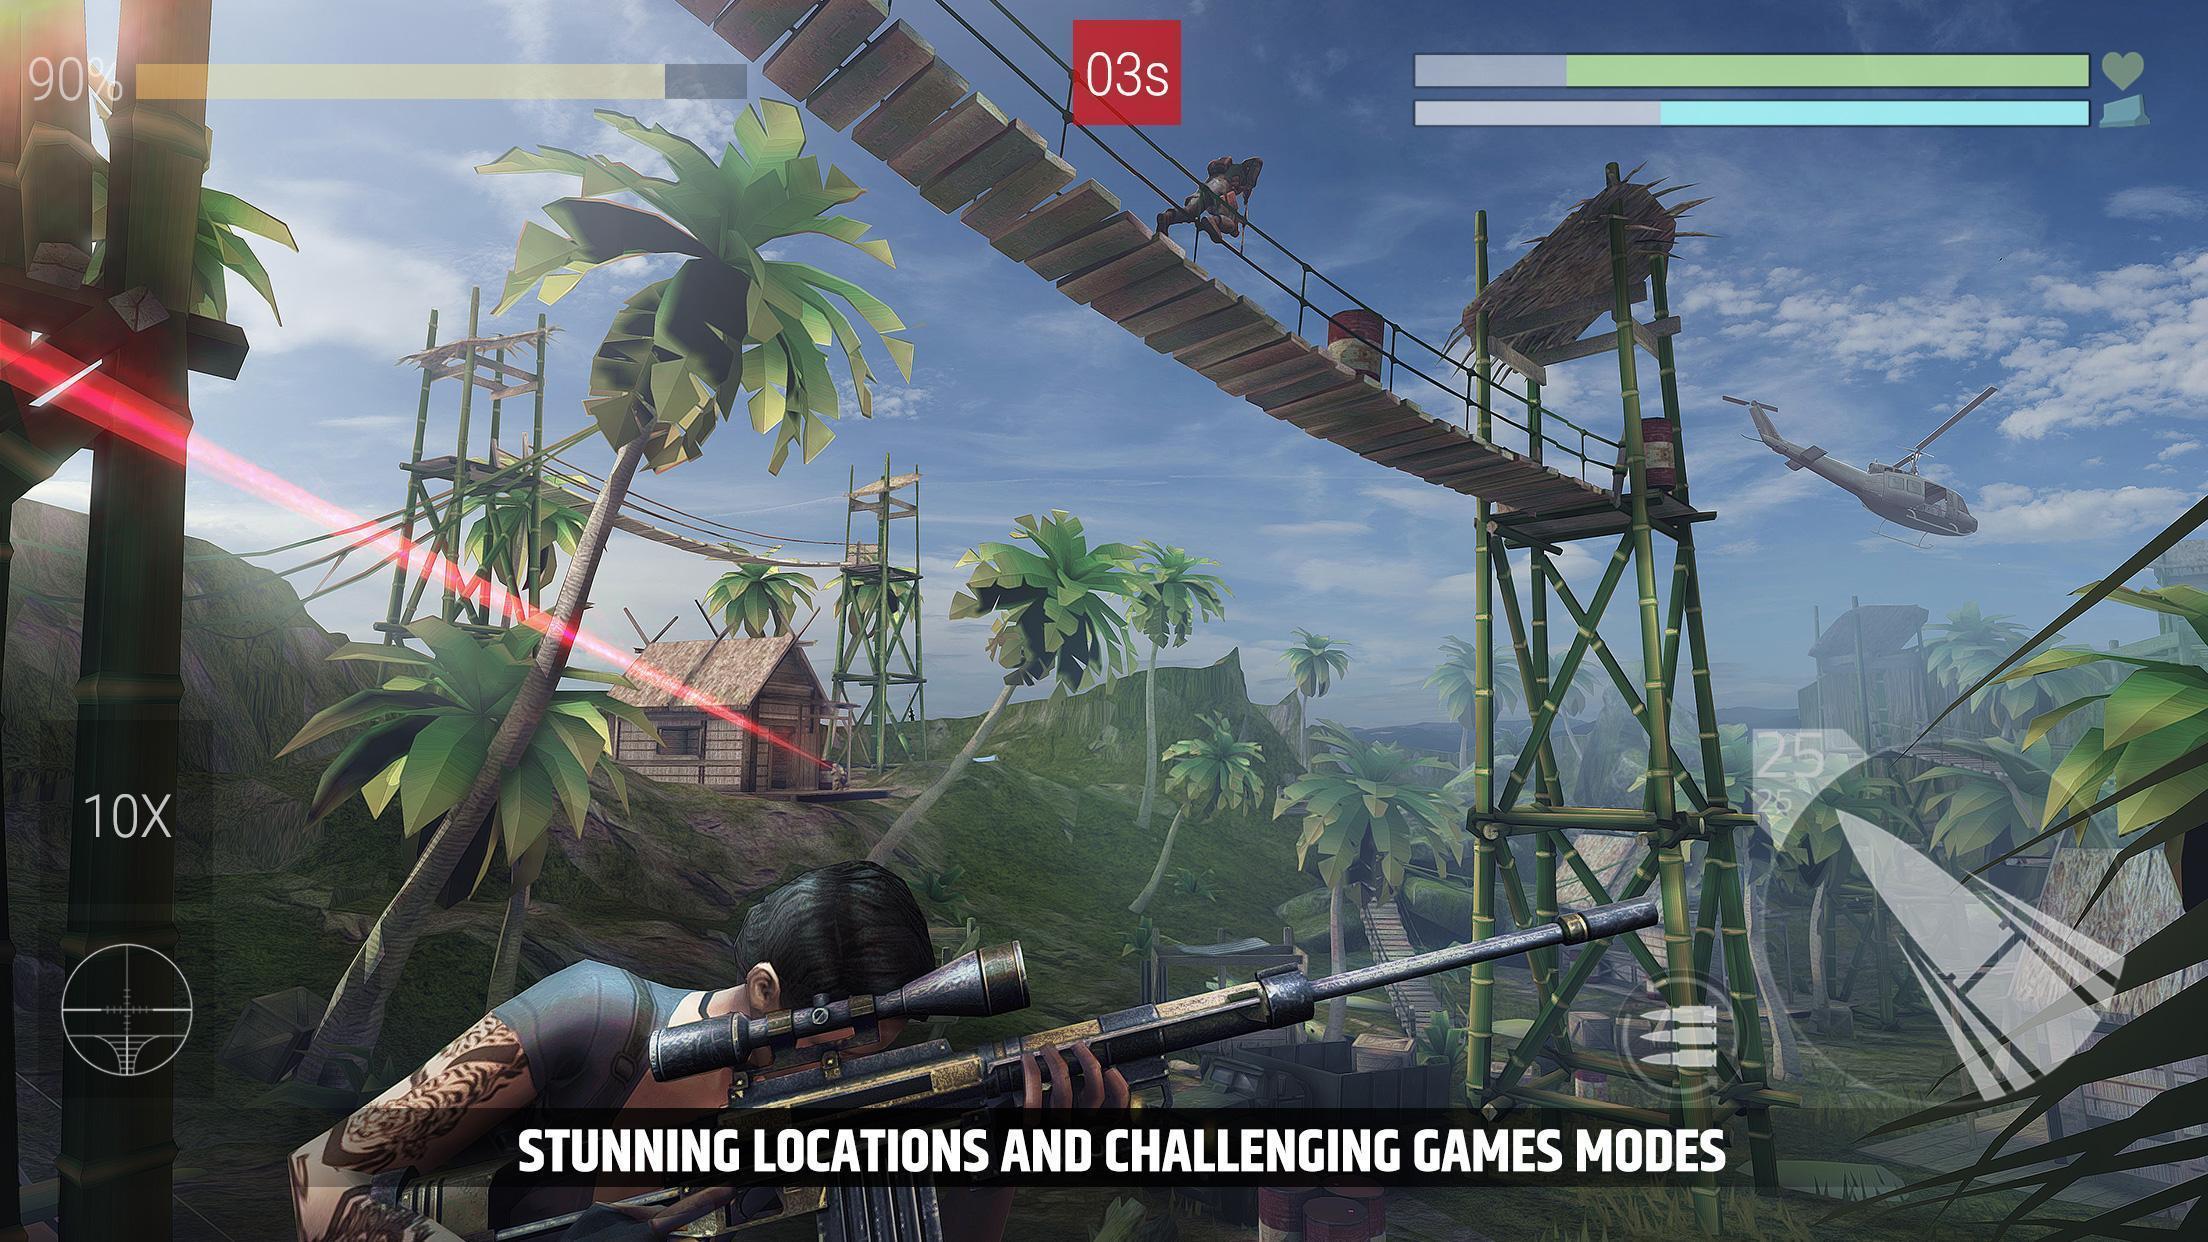 Cover Fire Offline Shooting Games 1.21.1 Screenshot 7